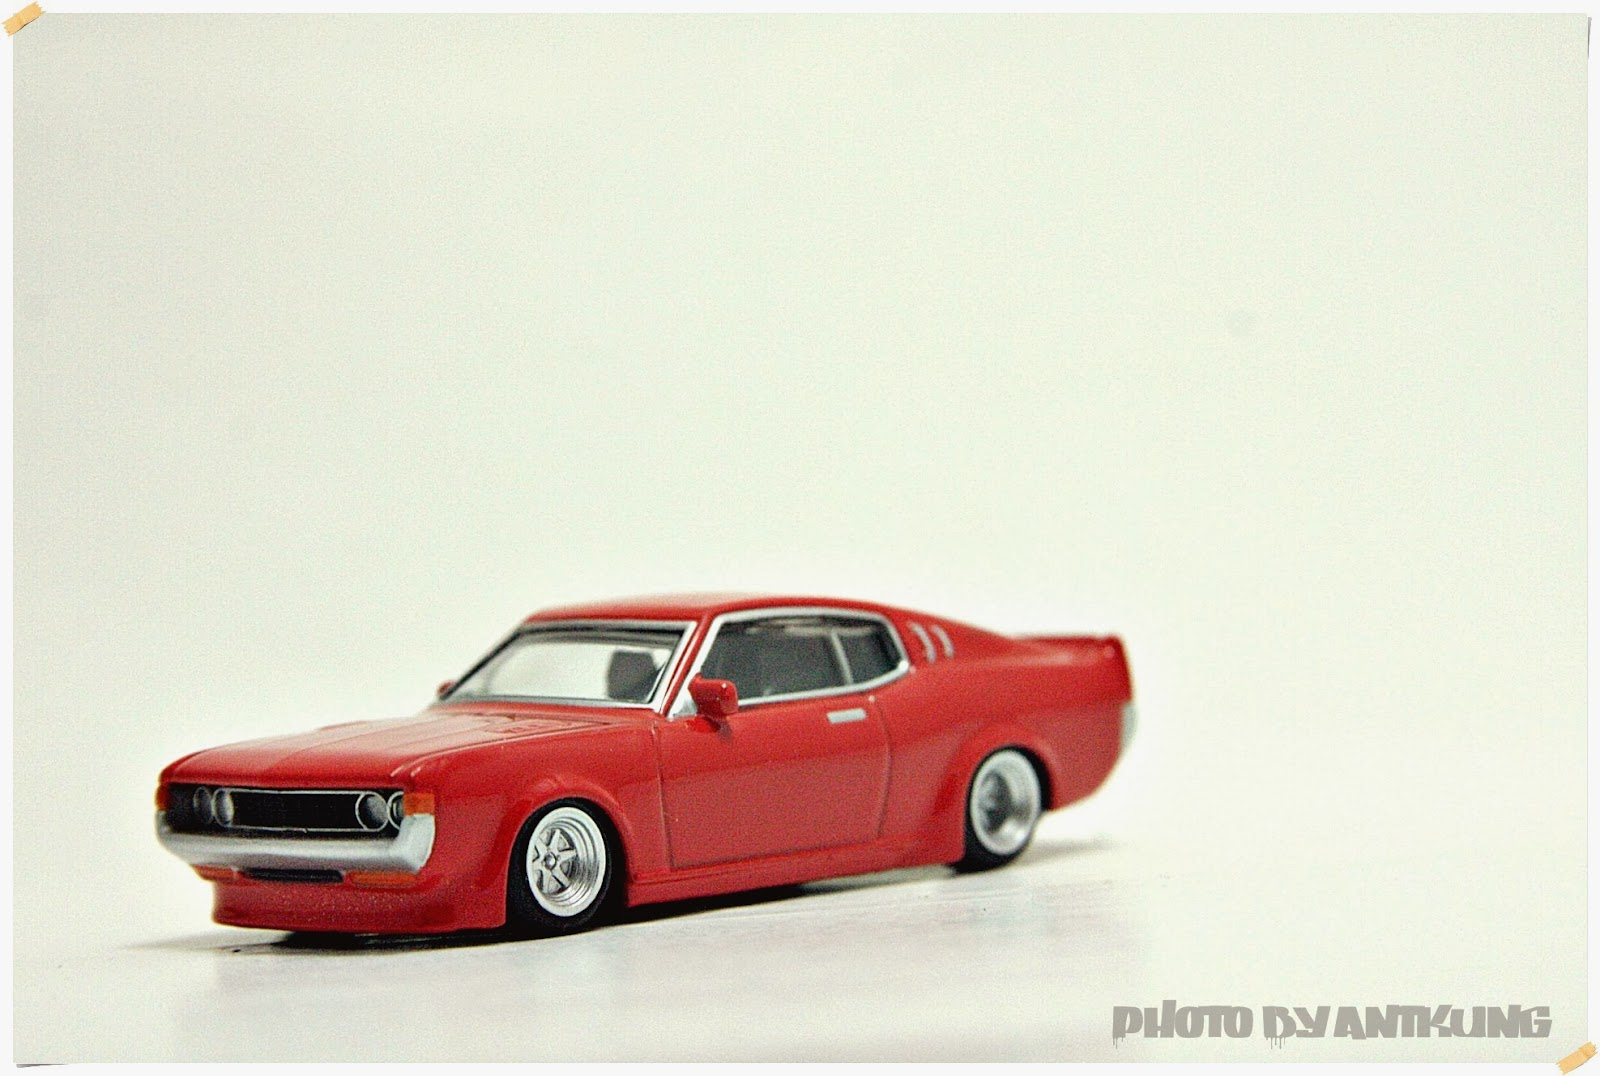 1973 Ra25 Toyota Celica Gt Red Eakky Eak Aoshima 1 64 Grand Champion Part 3